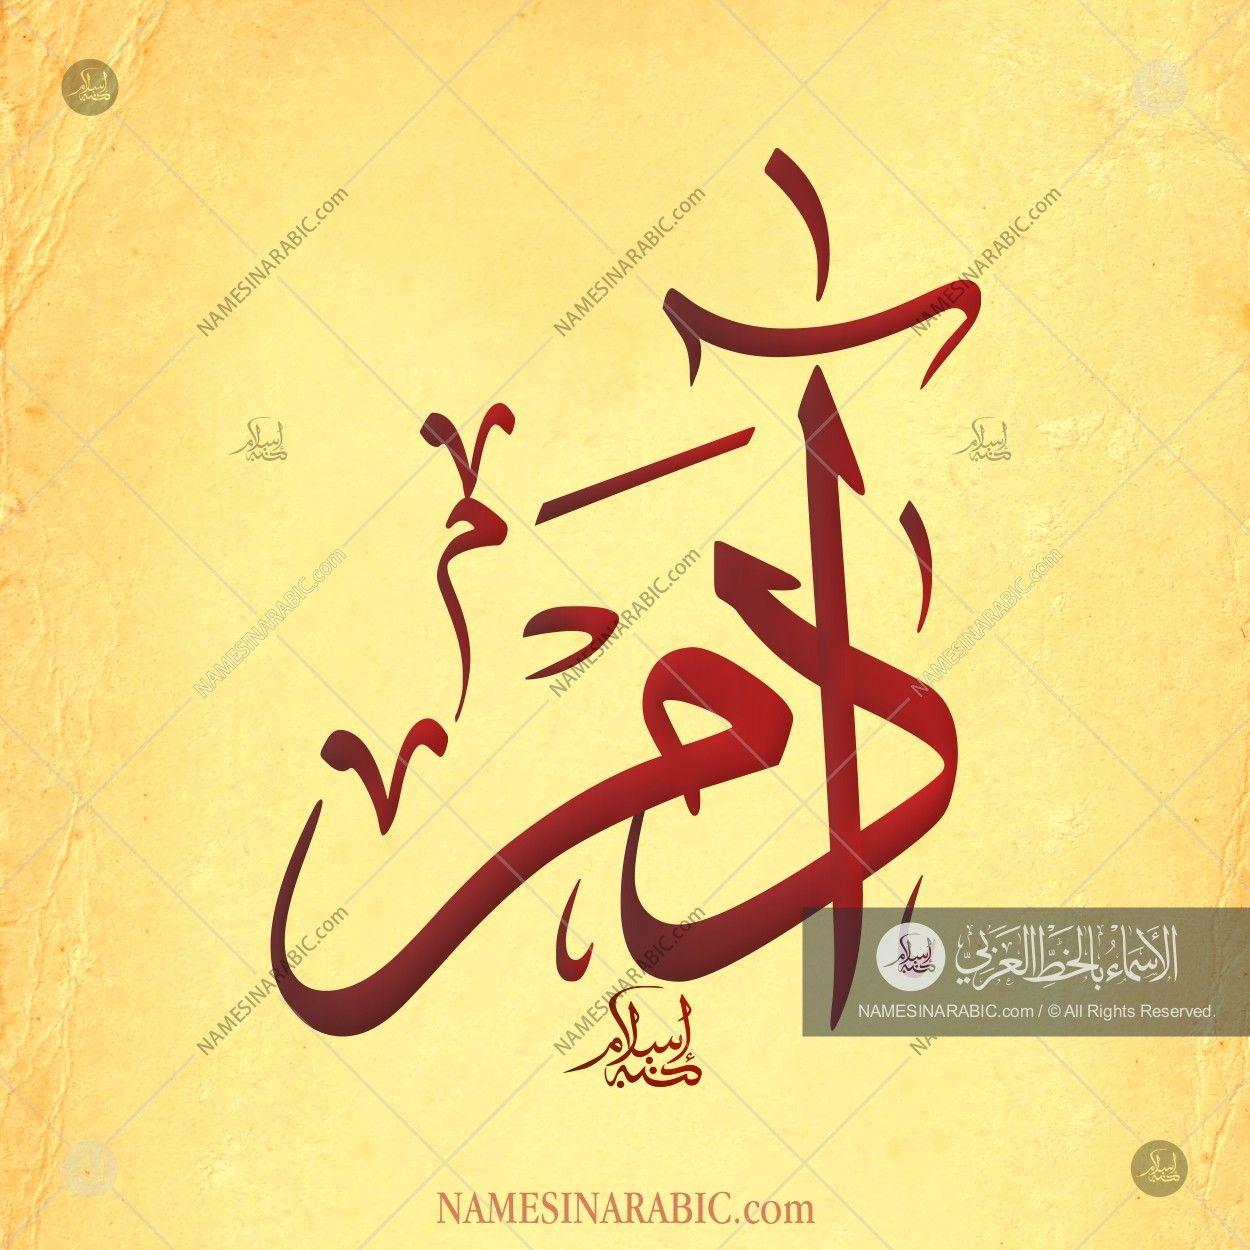 Adam Name In Arabic Calligraphy Arabic Calligraphy Art Calligraphy Calligraphy Art